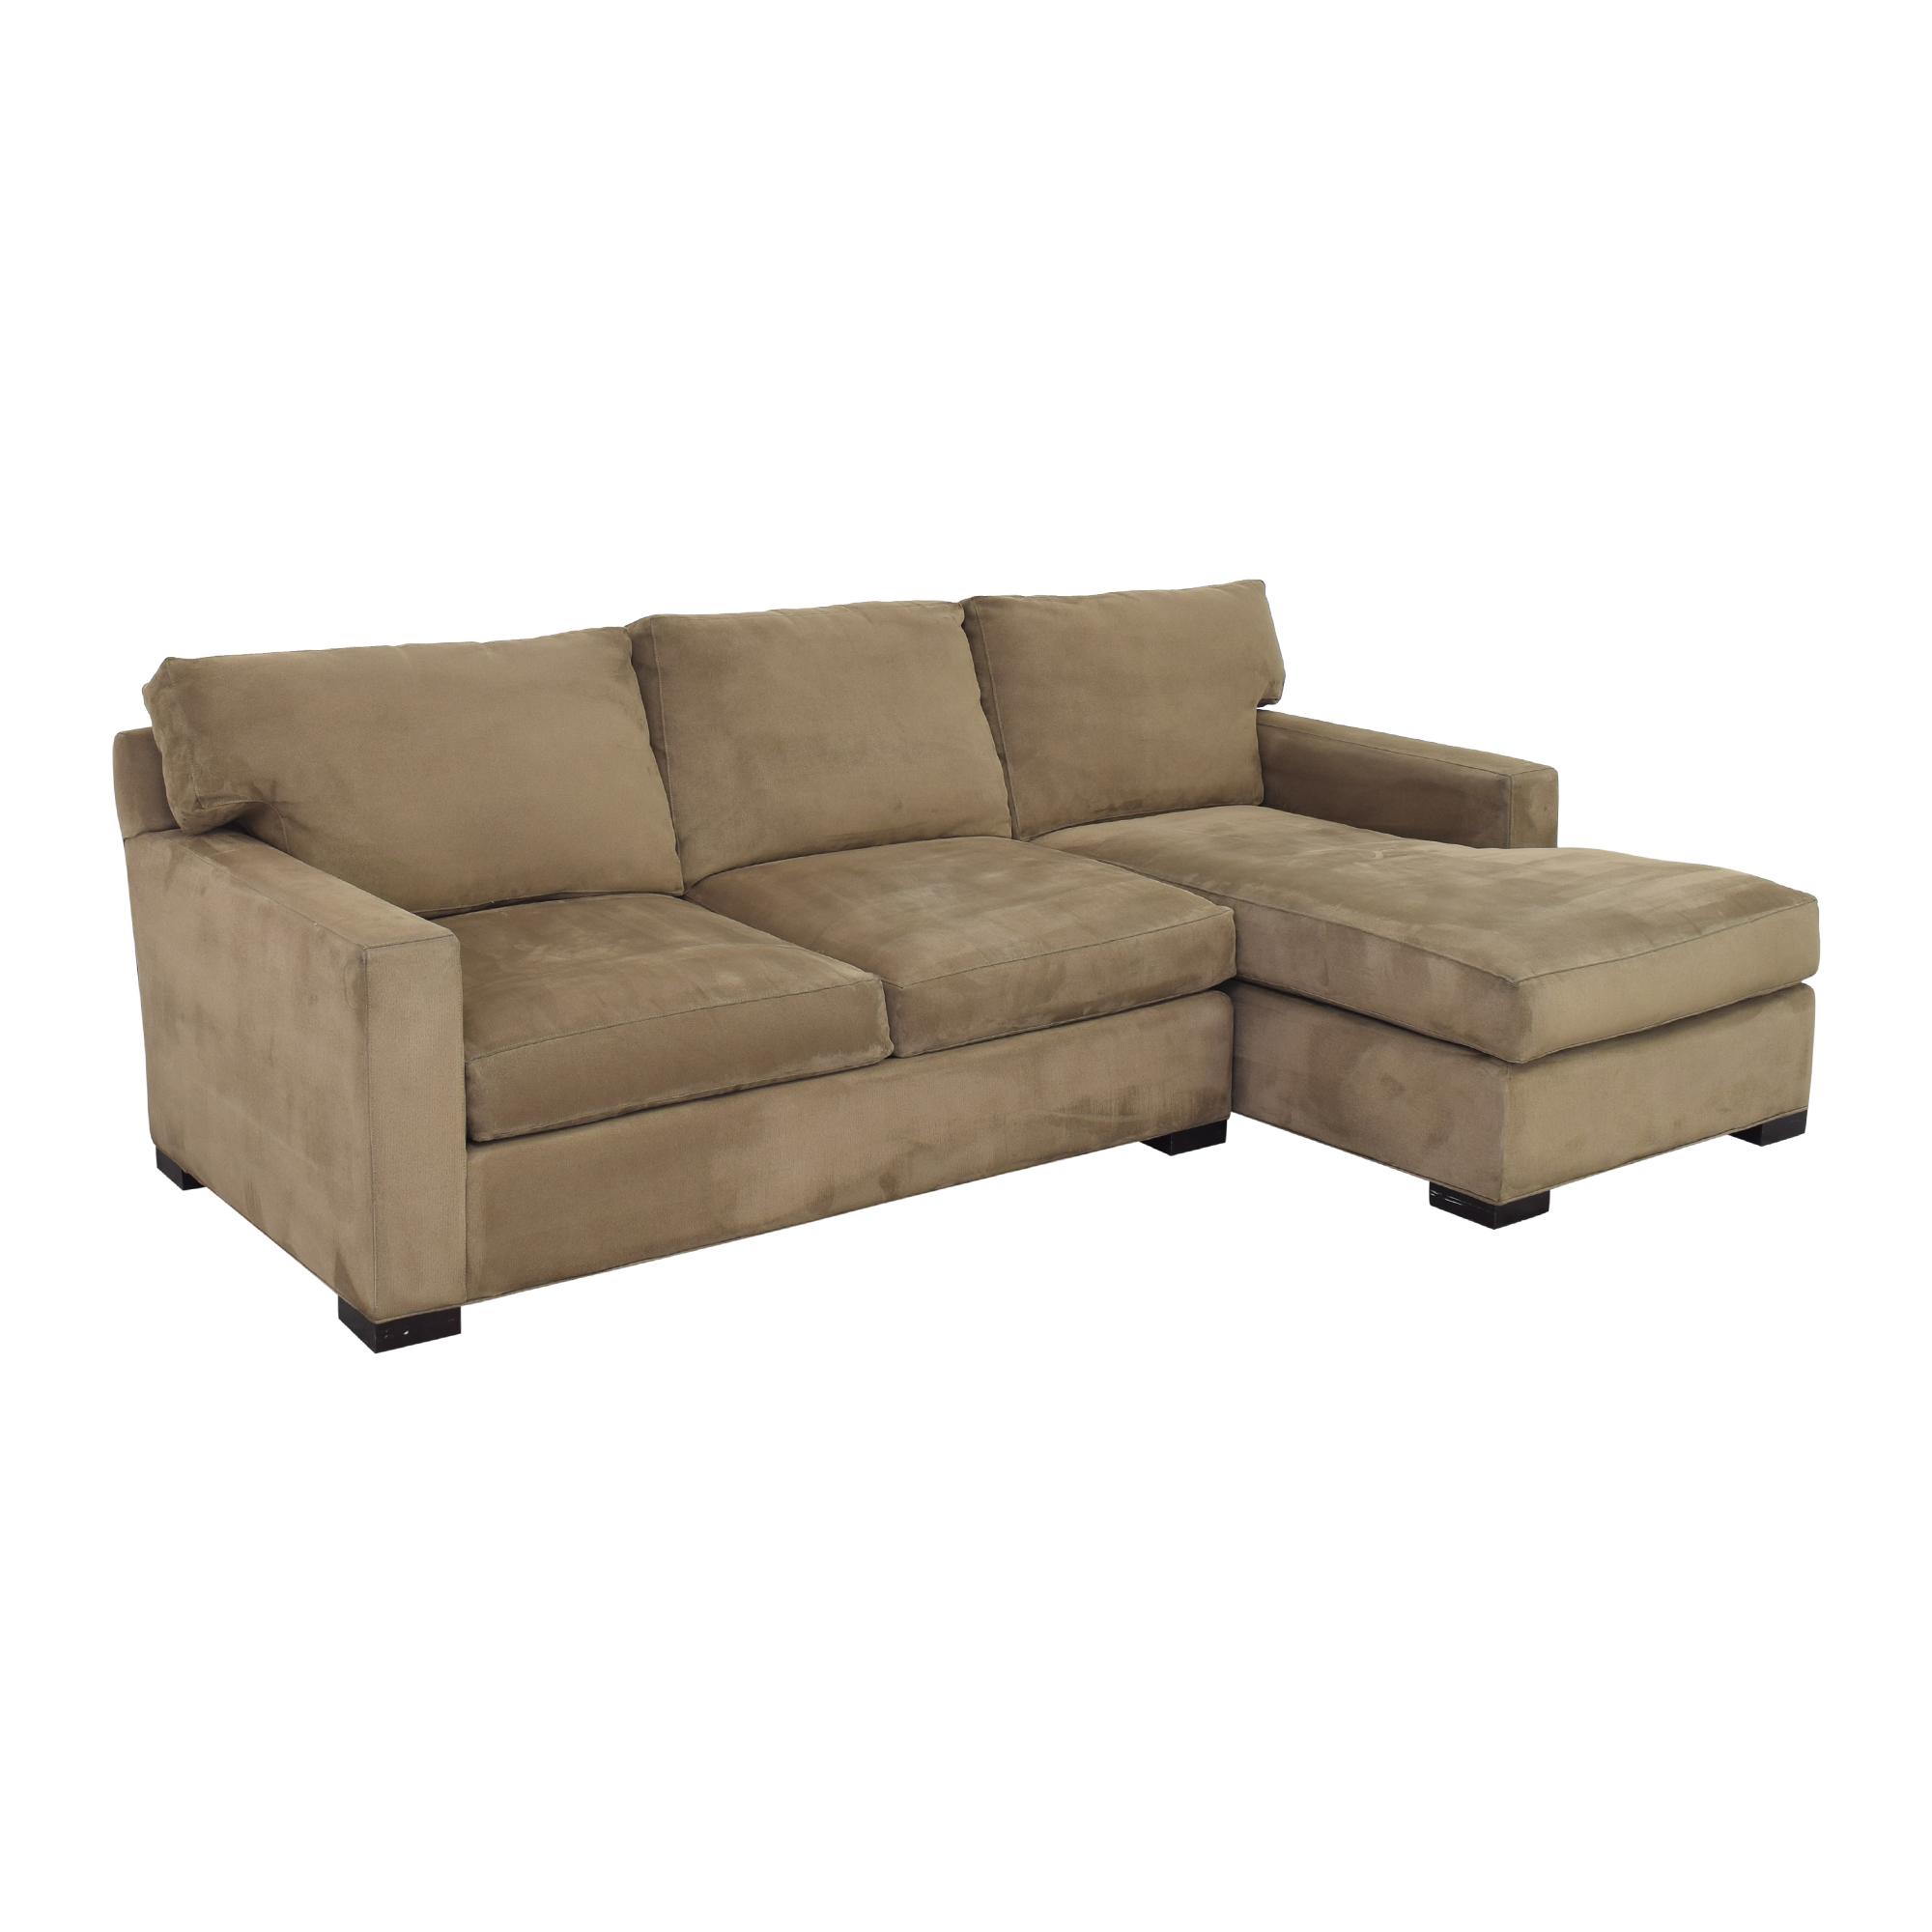 Crate & Barrel Crate & Barrel Axis Sectional Sofa light brown